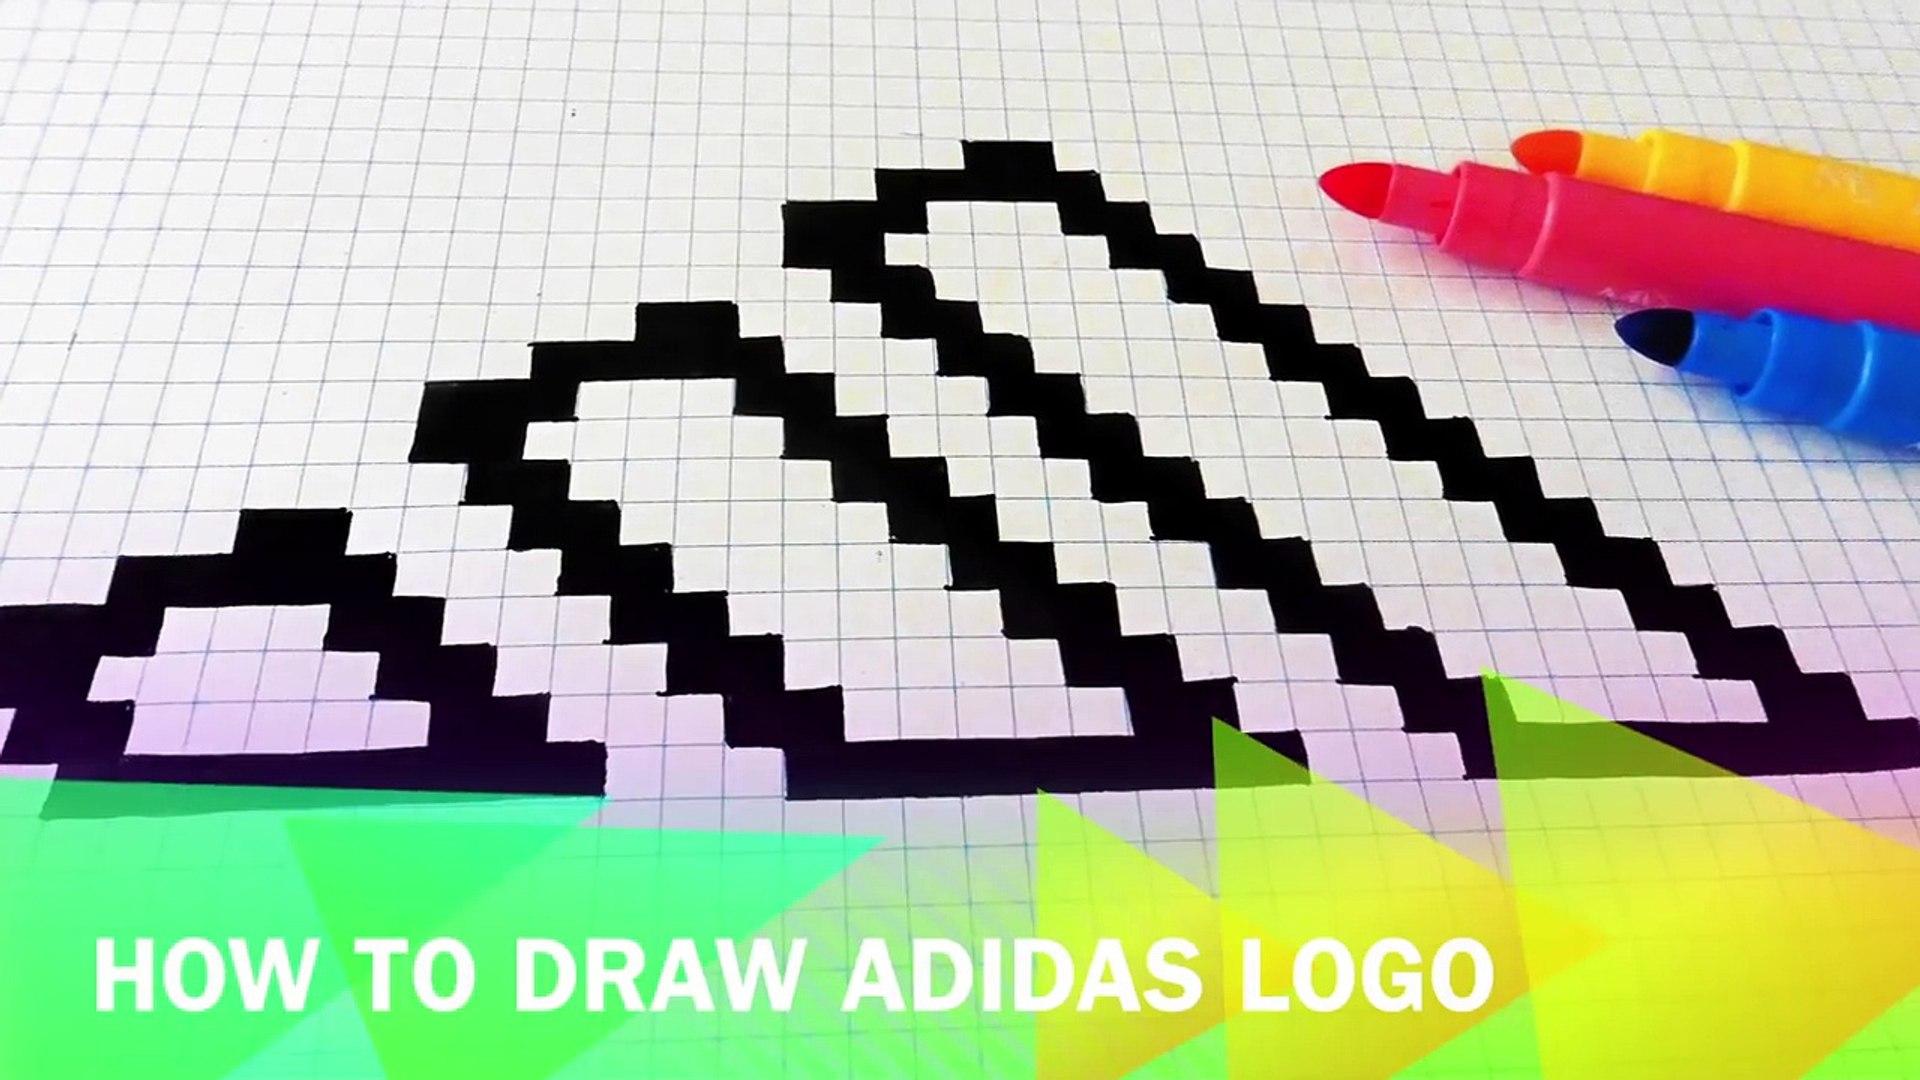 Handmade Pixel Art How To Draw Adidas Logo Pixelart